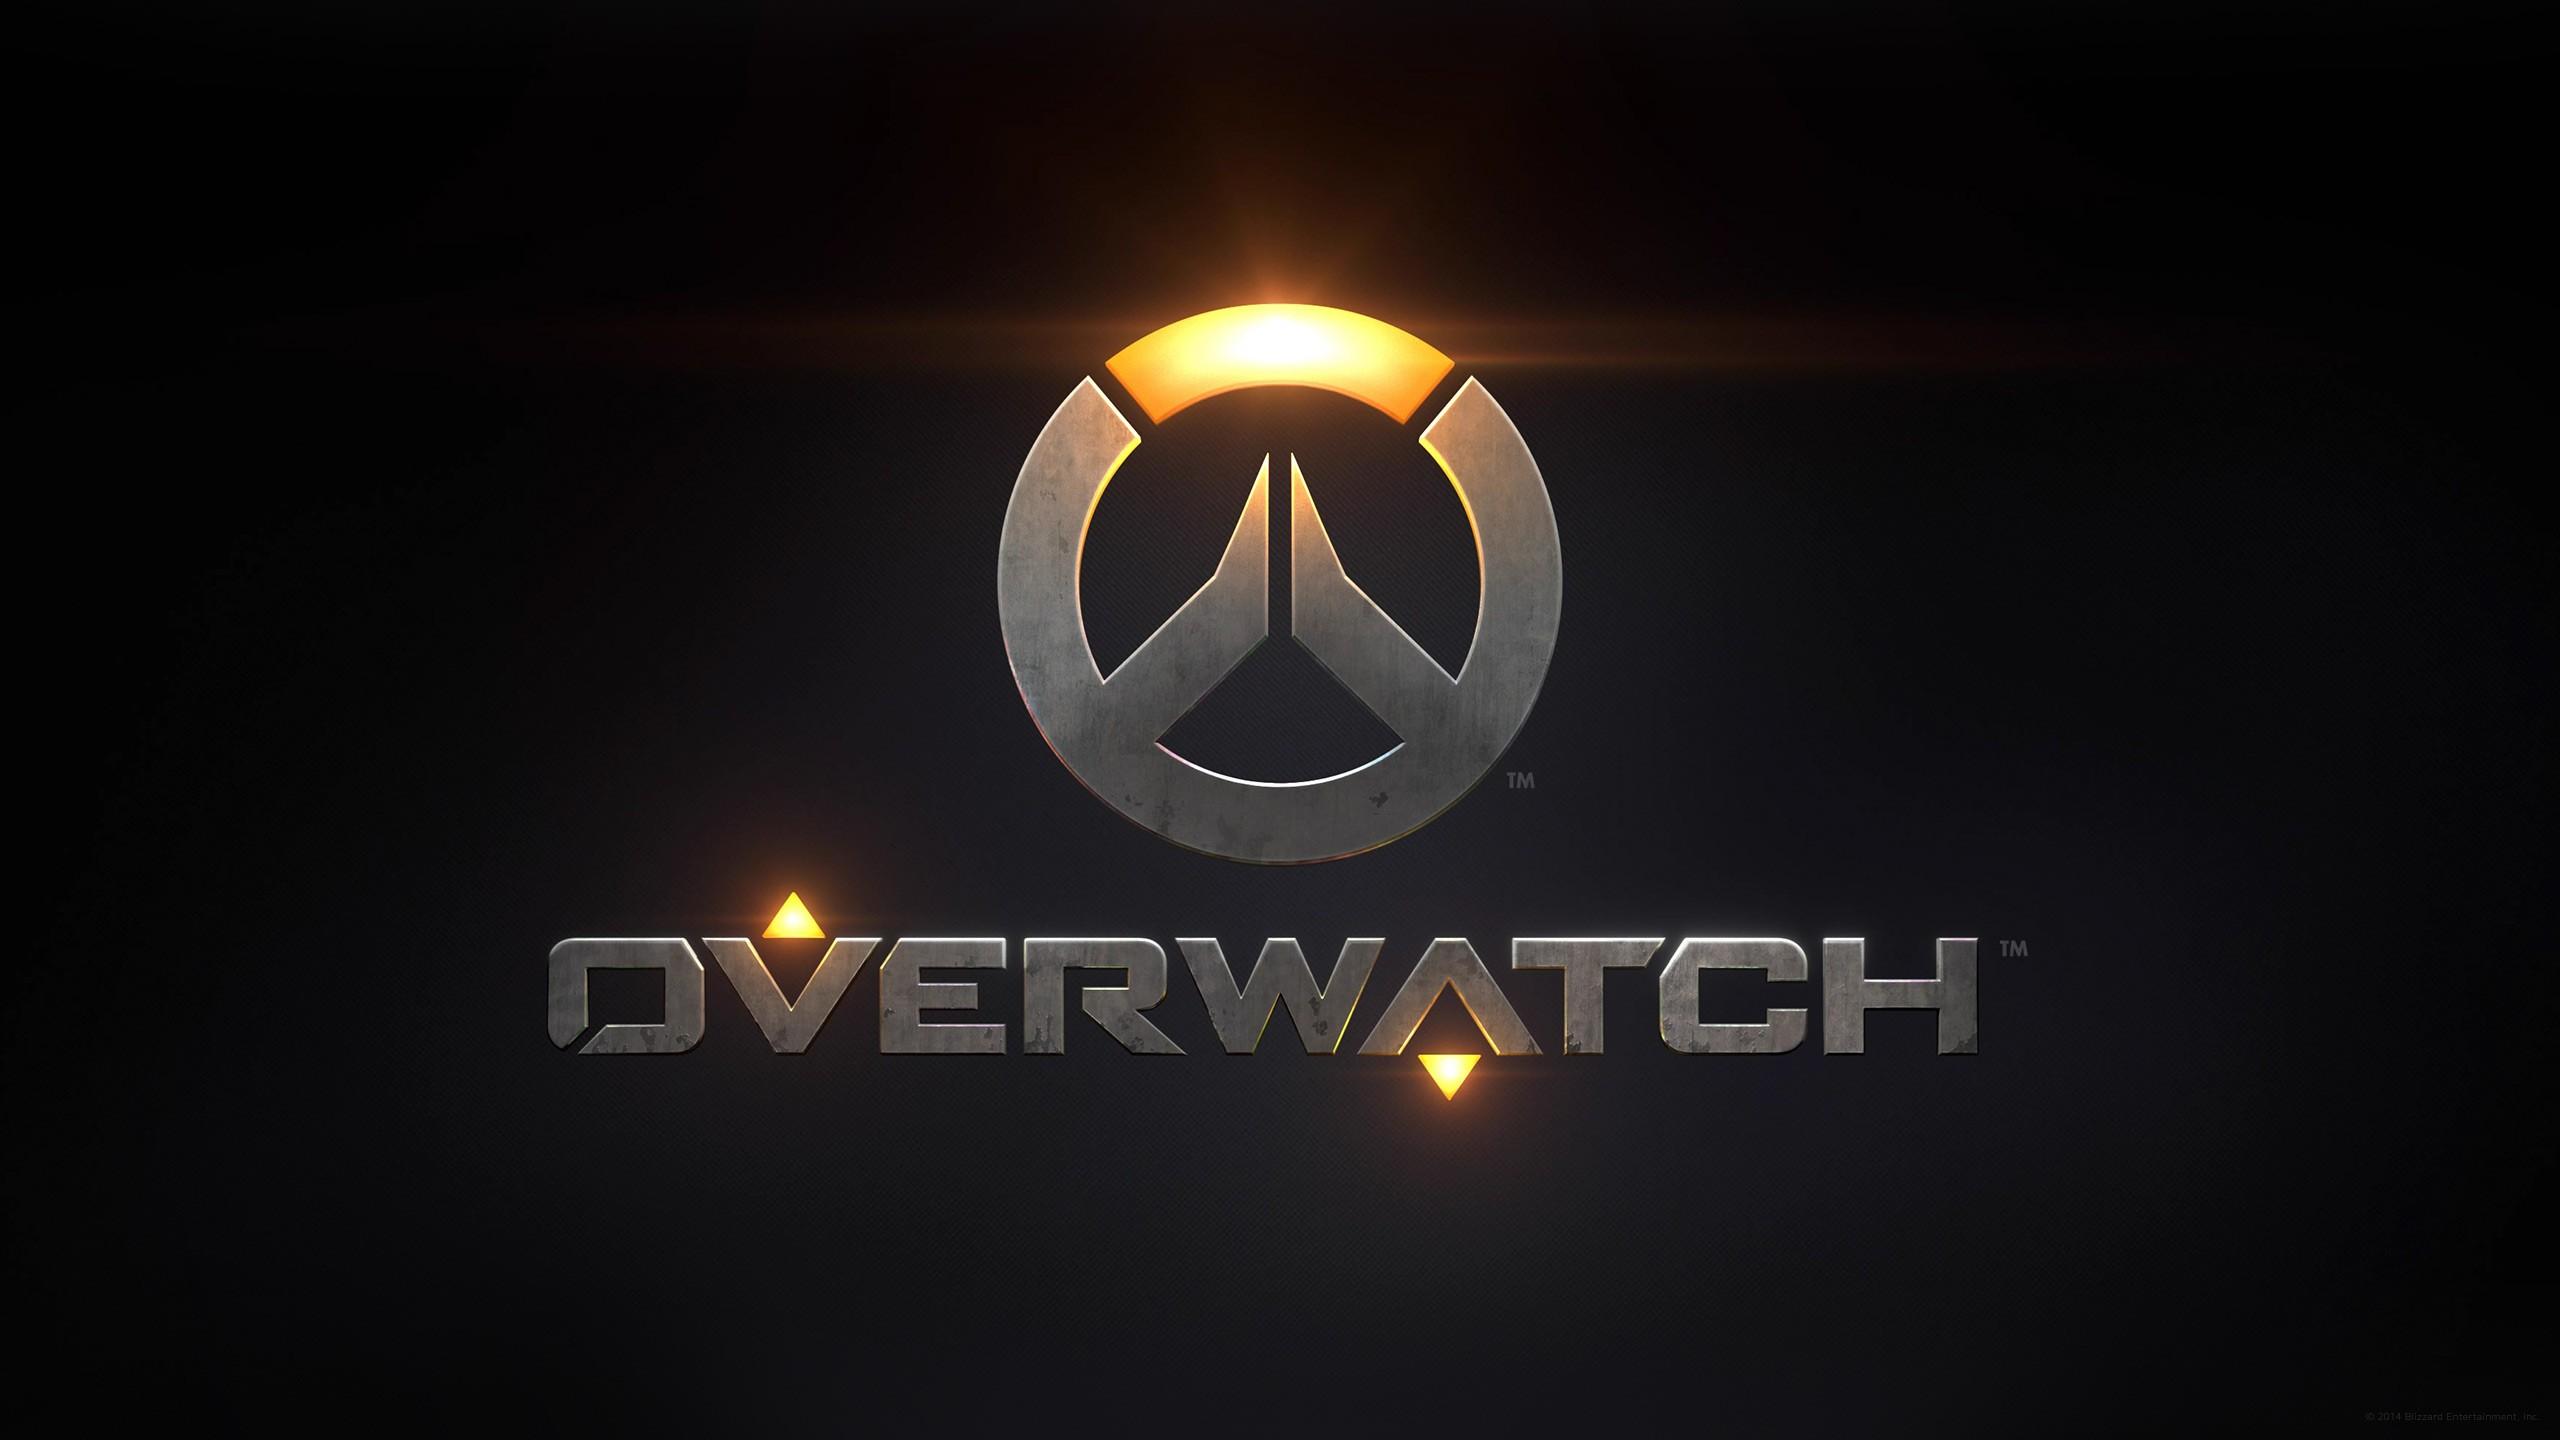 overwatch logo hd background wallpaper 66511